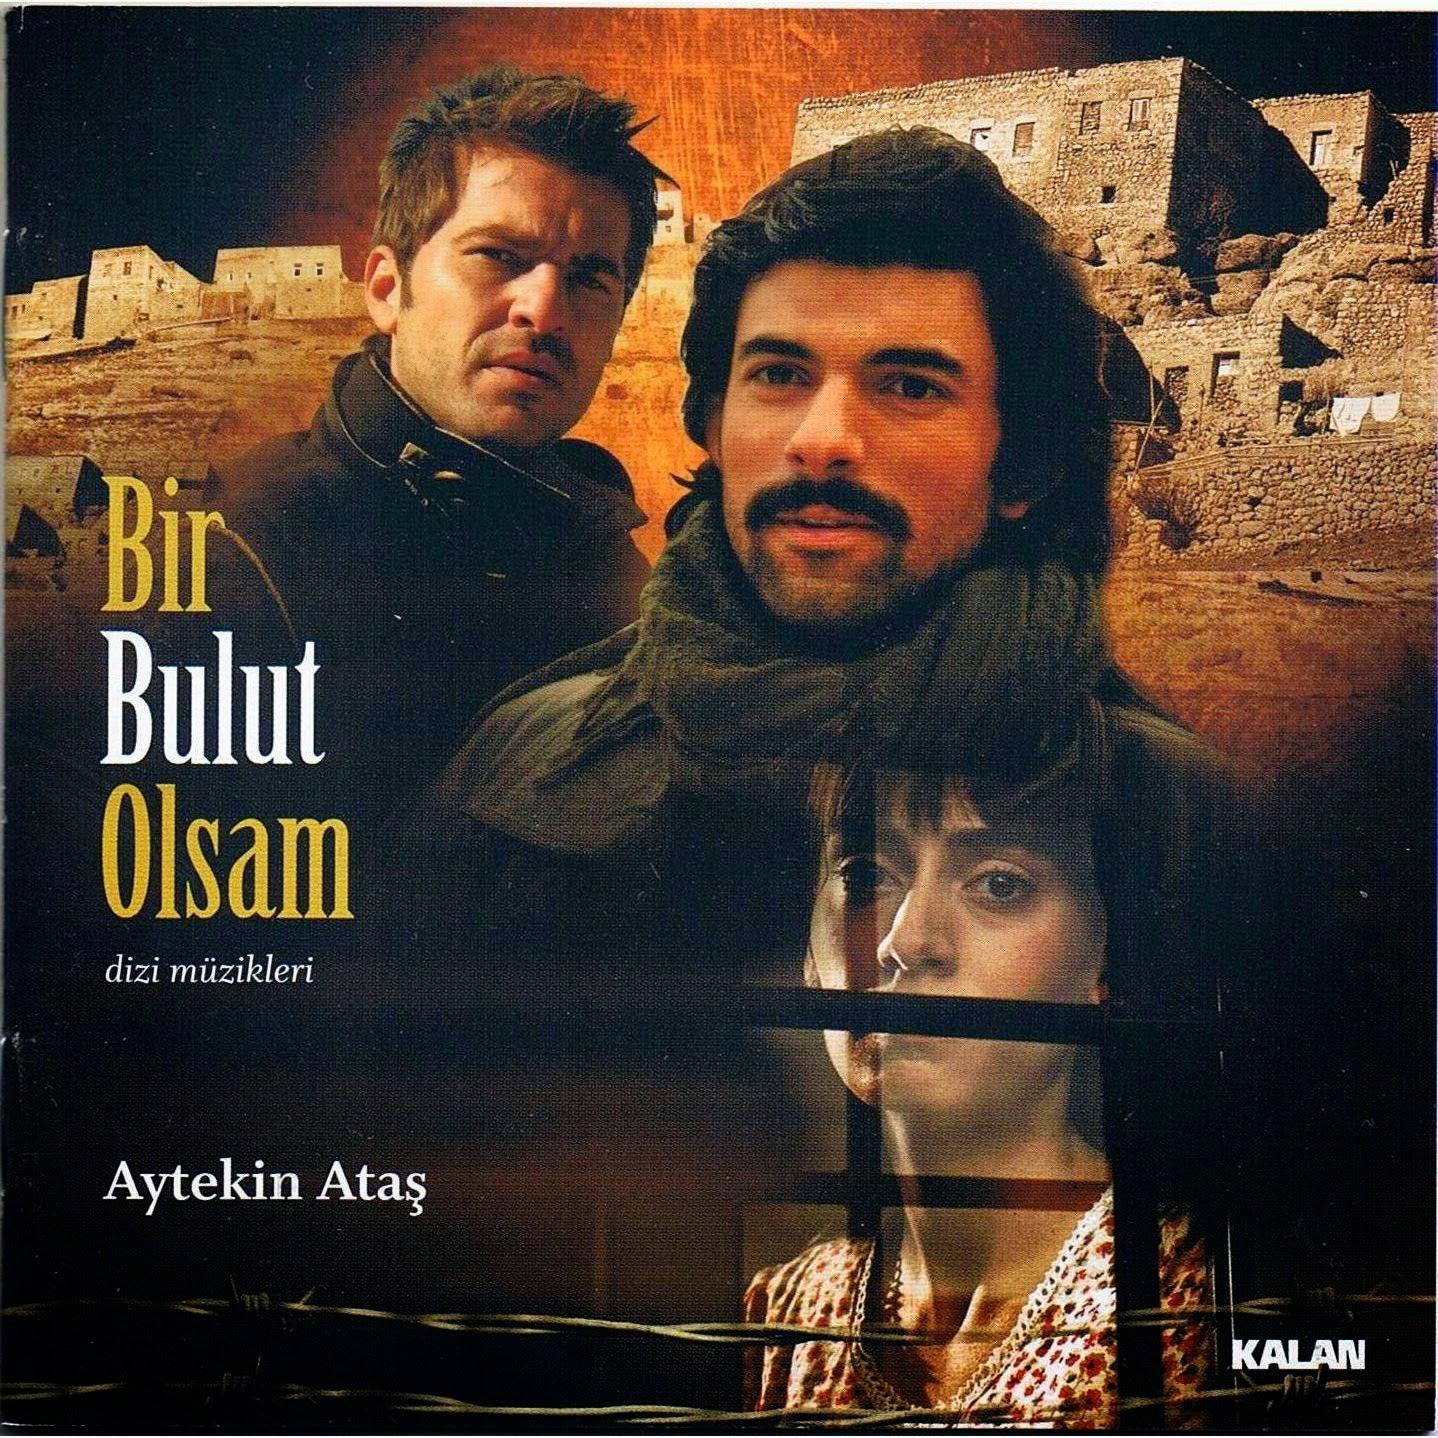 Bir Bulut Olsam - Πέρα από τα σύννεφα